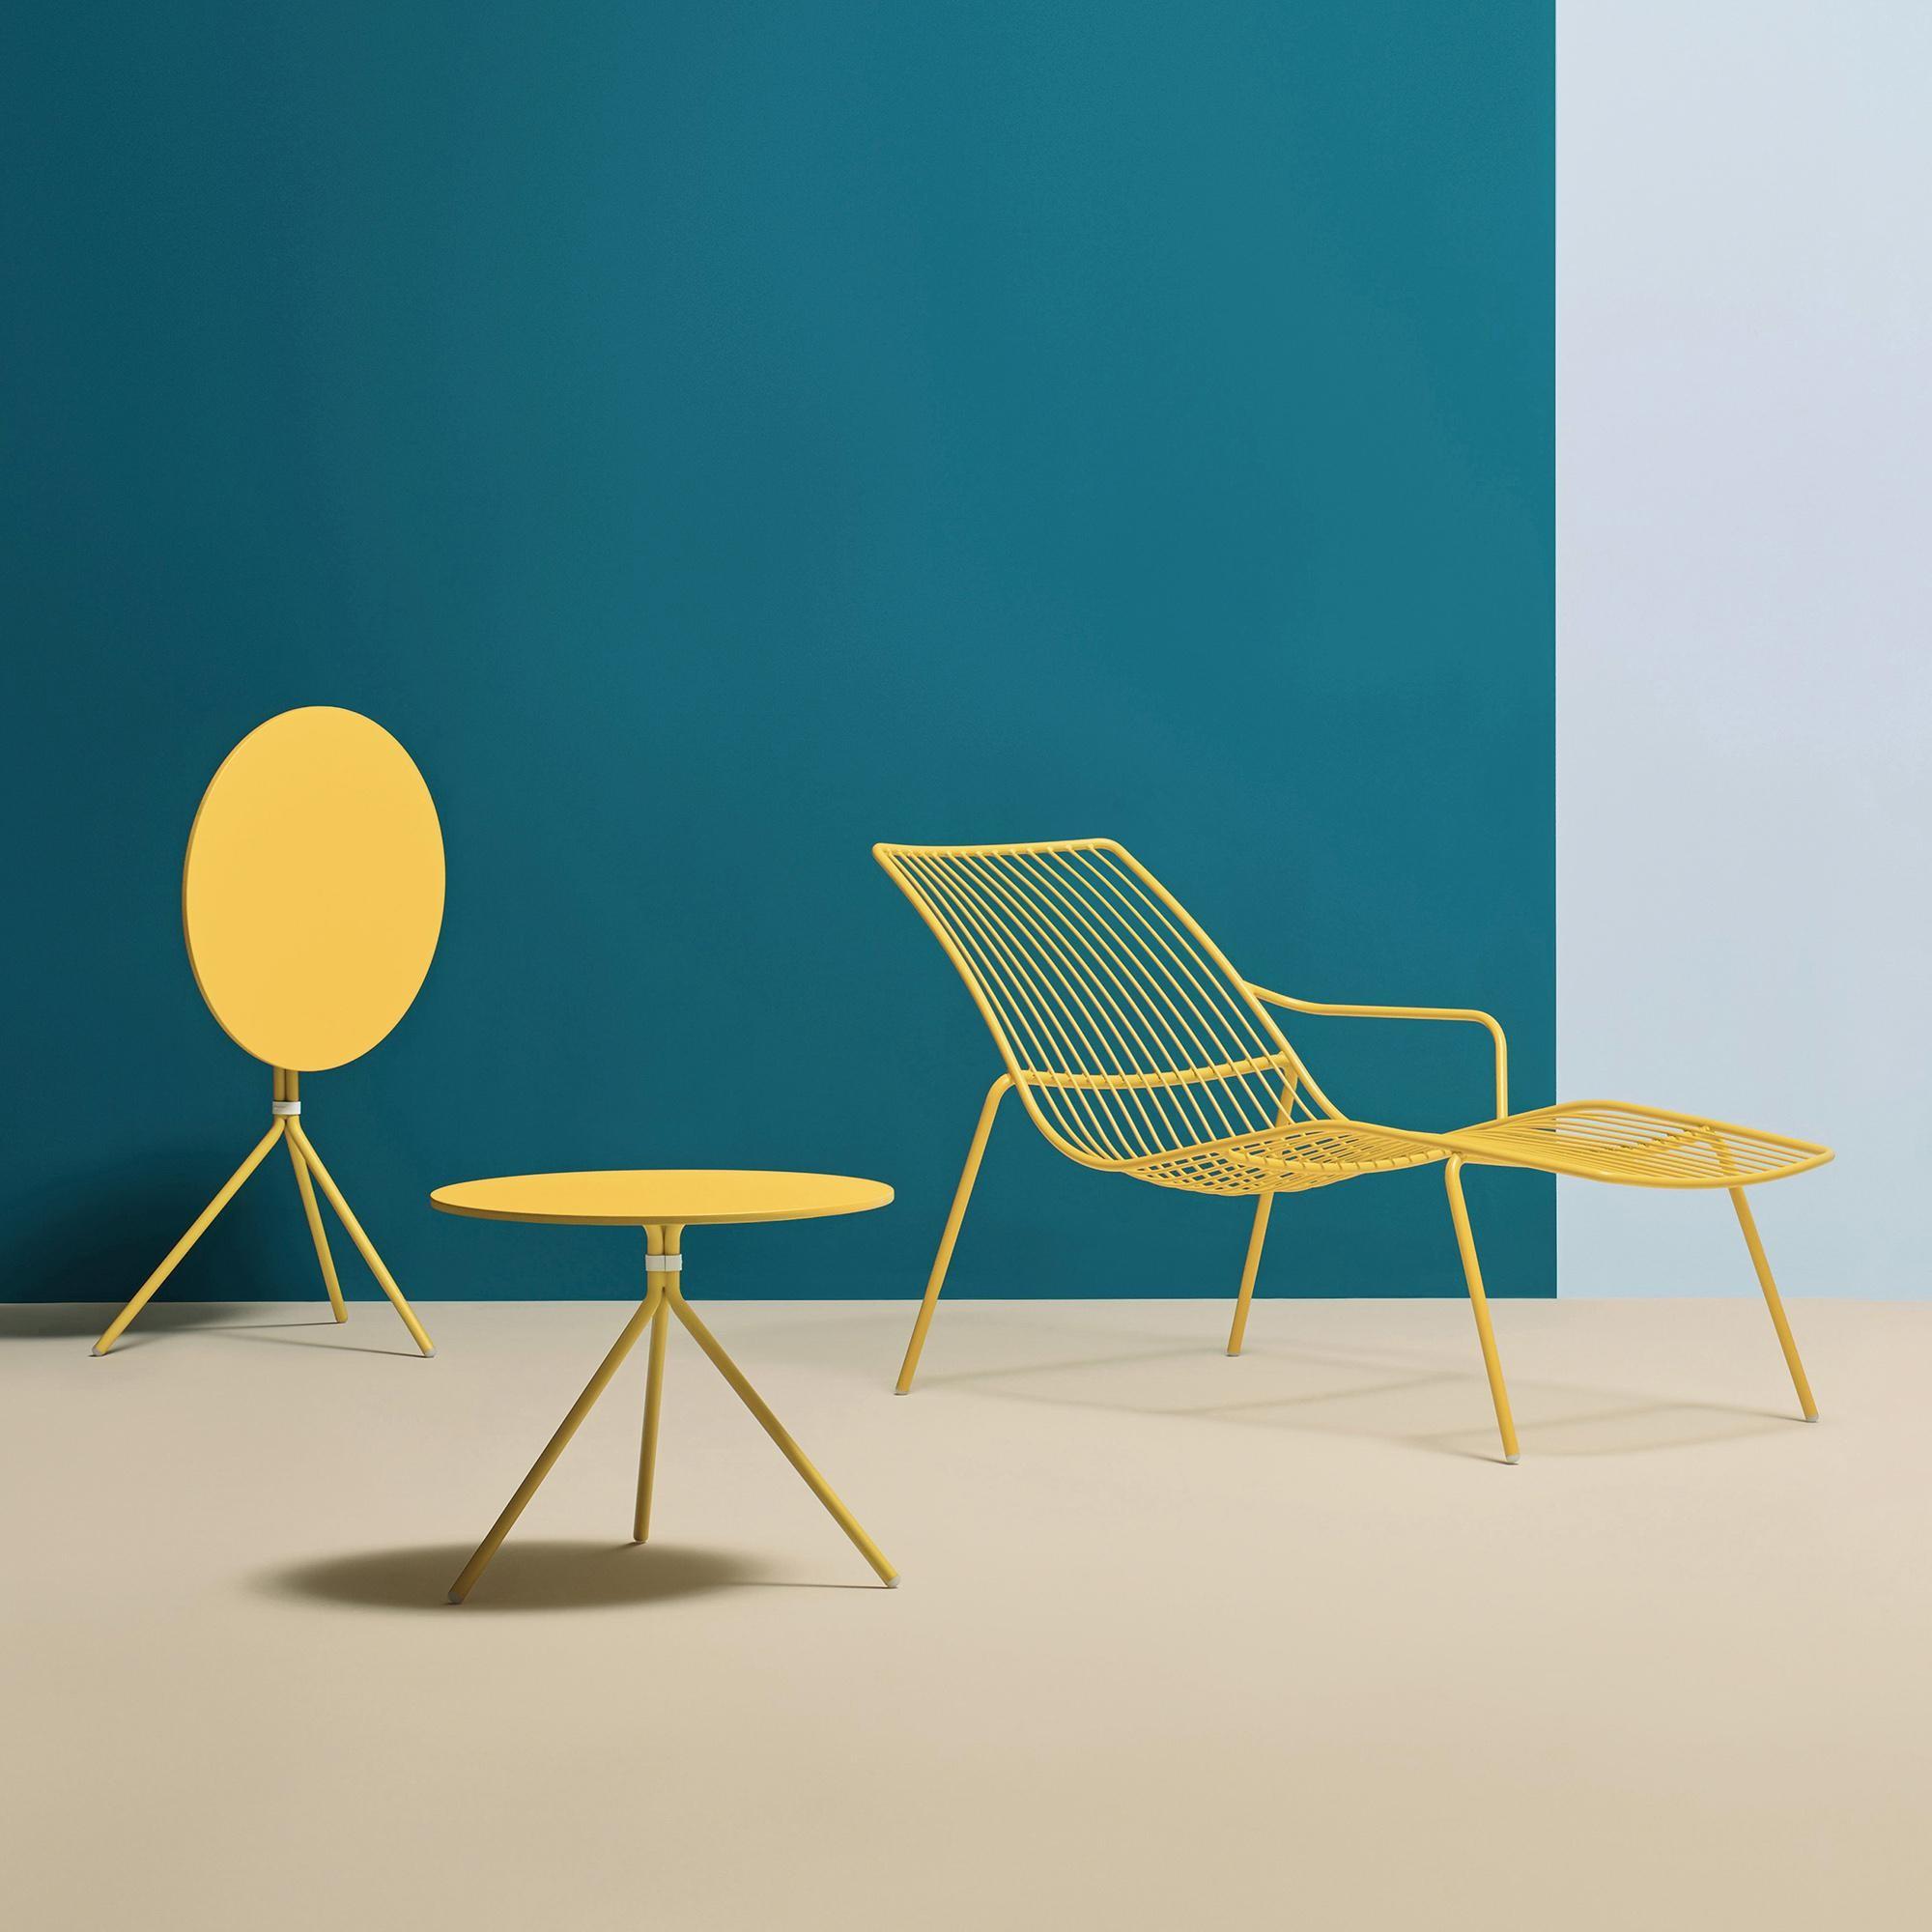 pedrali nolita 3654 7 auflage f r sonnenliege ambientedirect. Black Bedroom Furniture Sets. Home Design Ideas